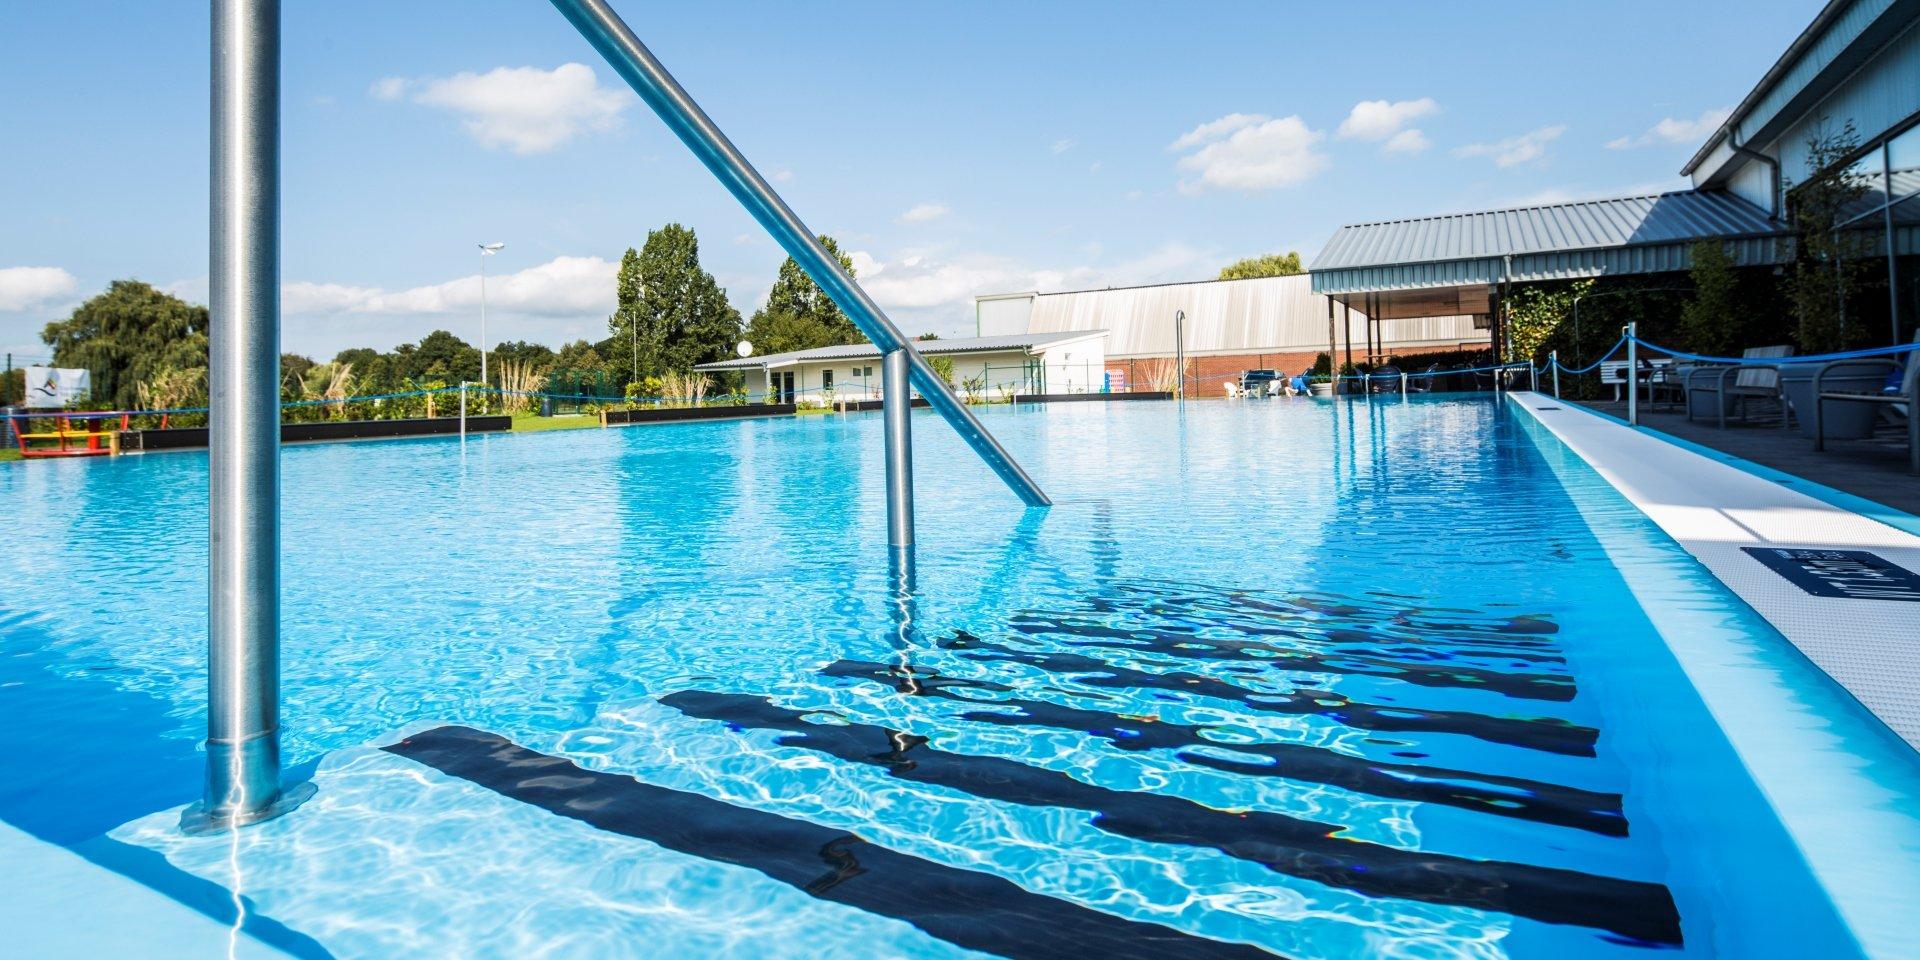 Steuler Pools BEKAPOOL Dinkelbad Neuenhaus Details